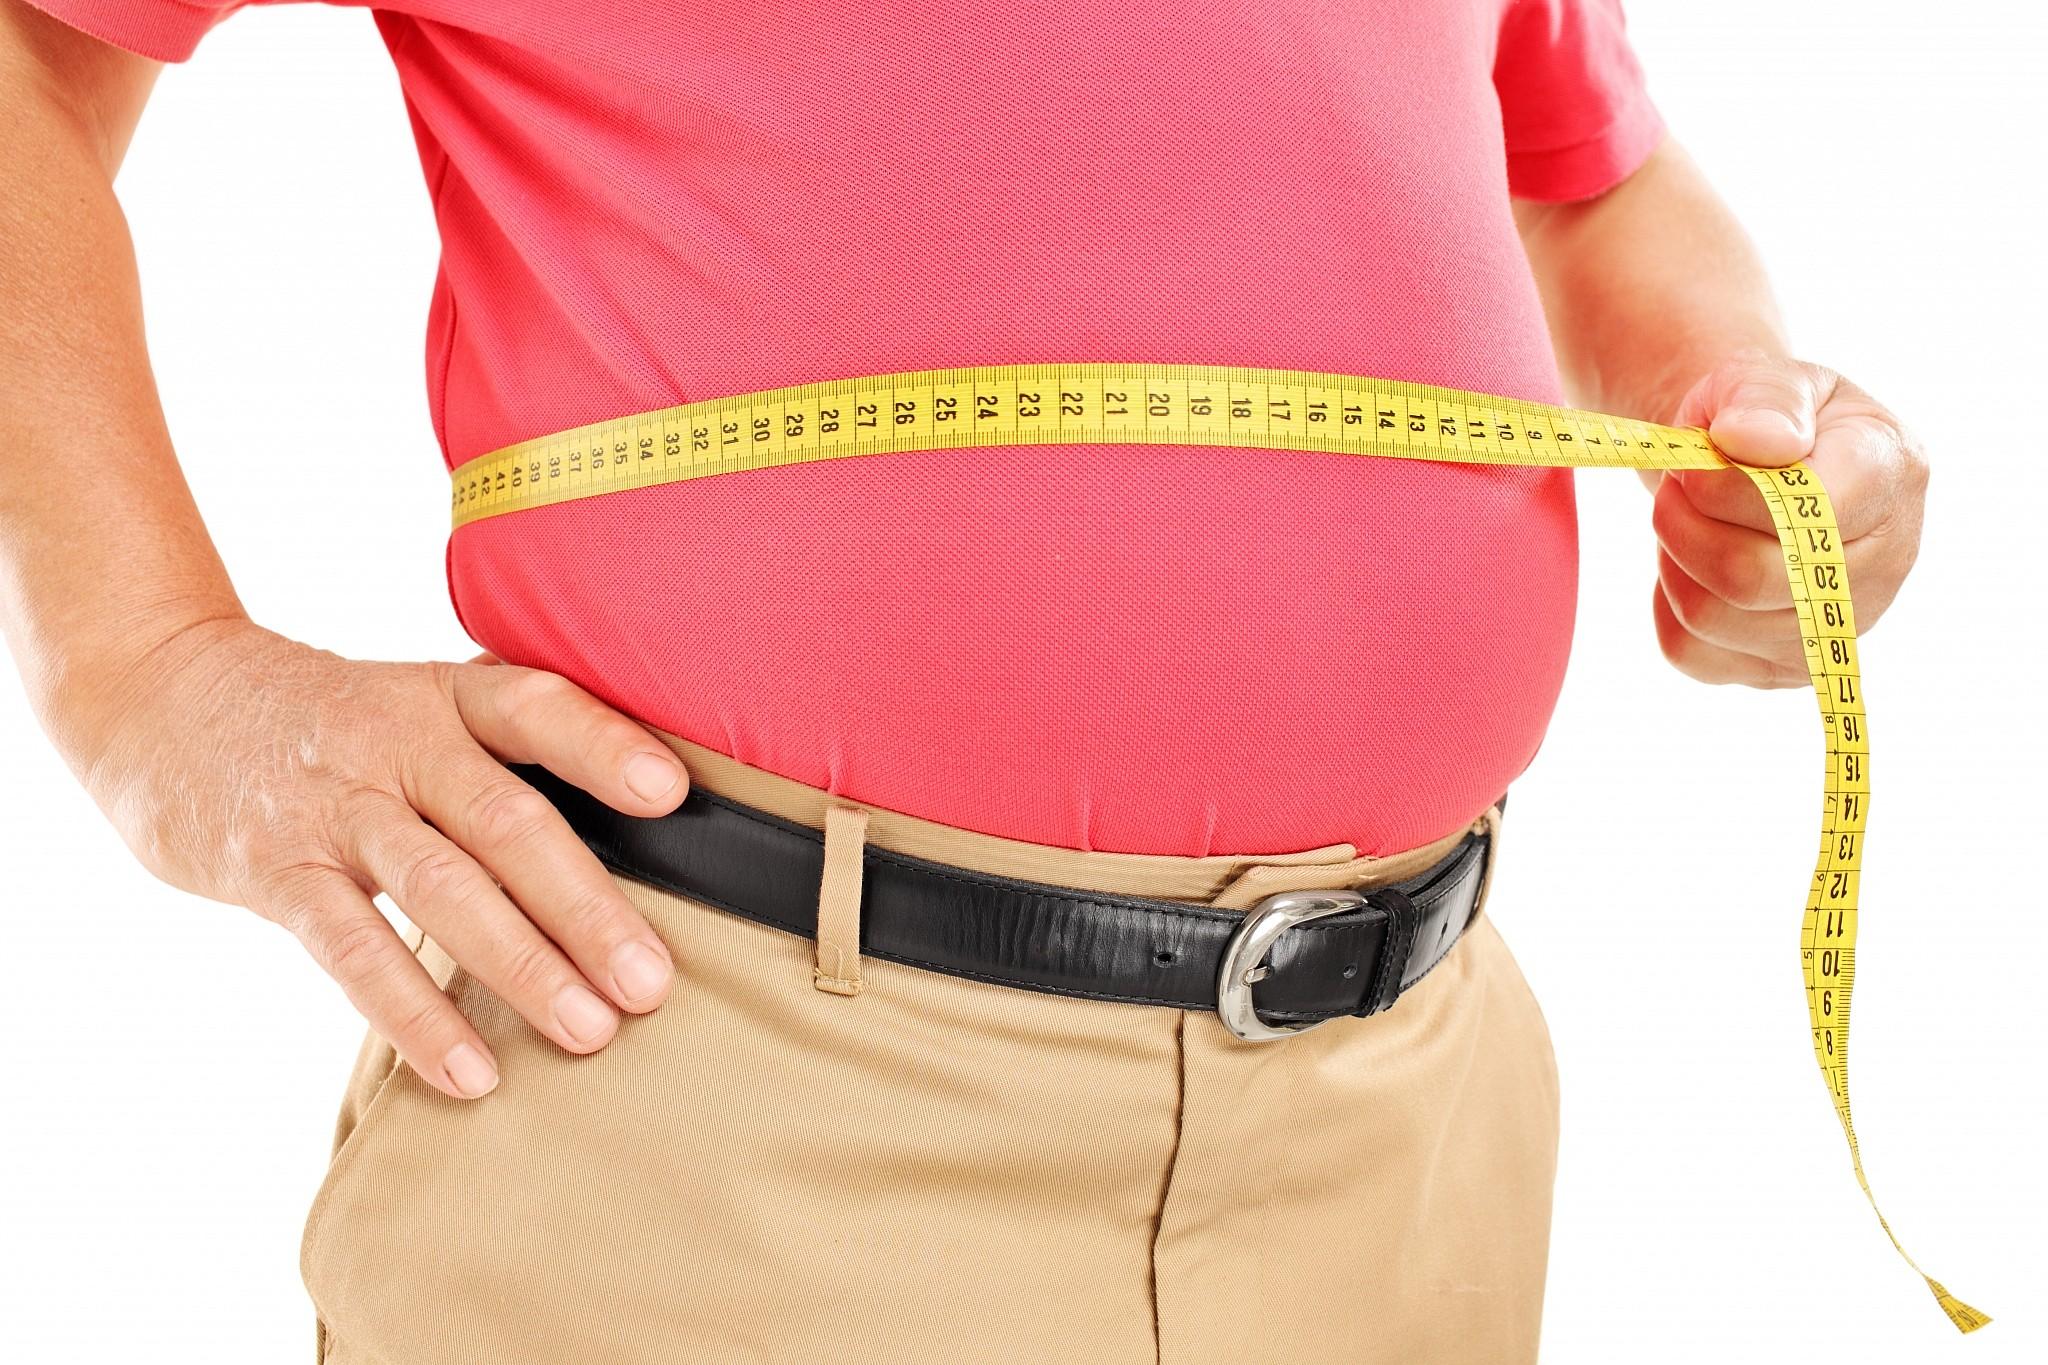 OECD health report: Majority of people overweight